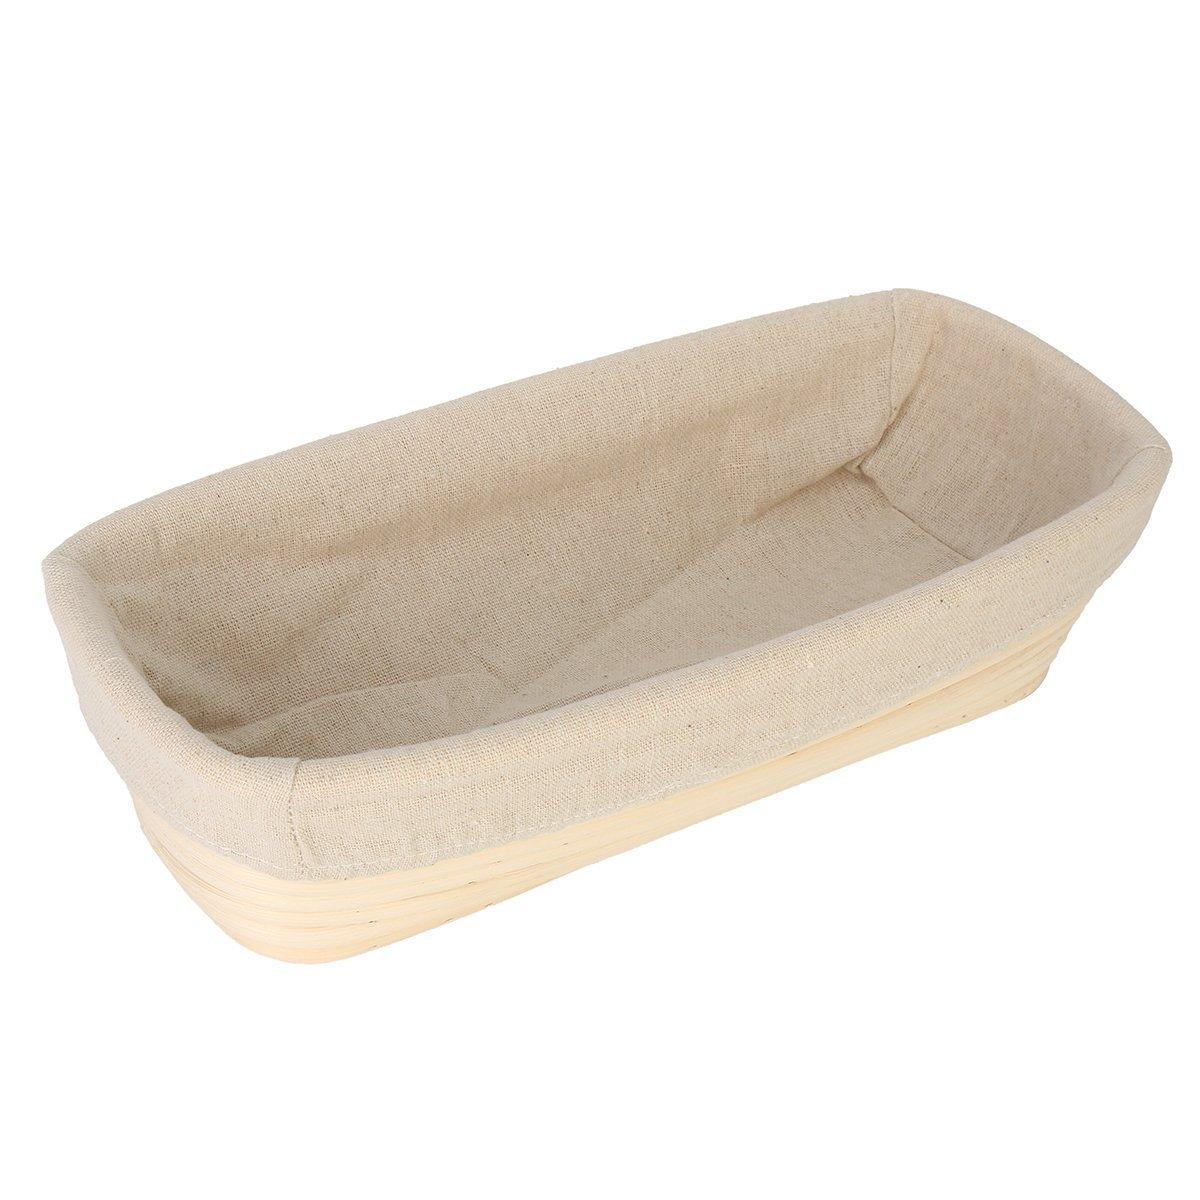 BetterJonny - 12 Oblong Banneton Brotform Bread Dough Proofing Basket & Liner Combo COMINHKPR116704